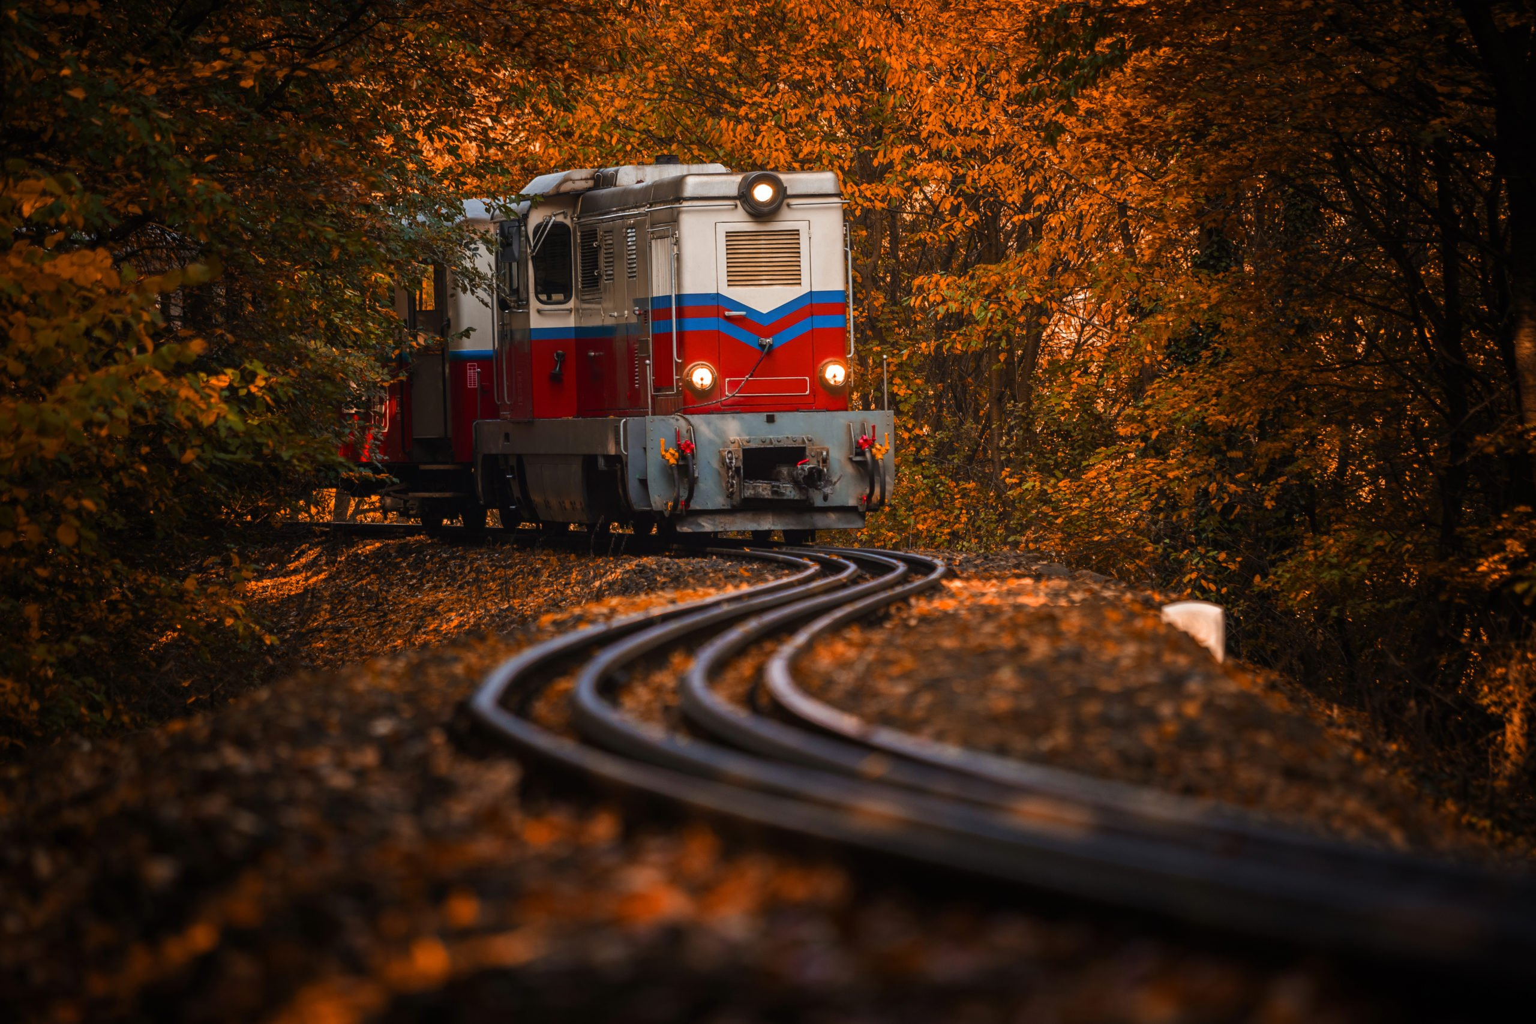 Transport in Eastern Europe